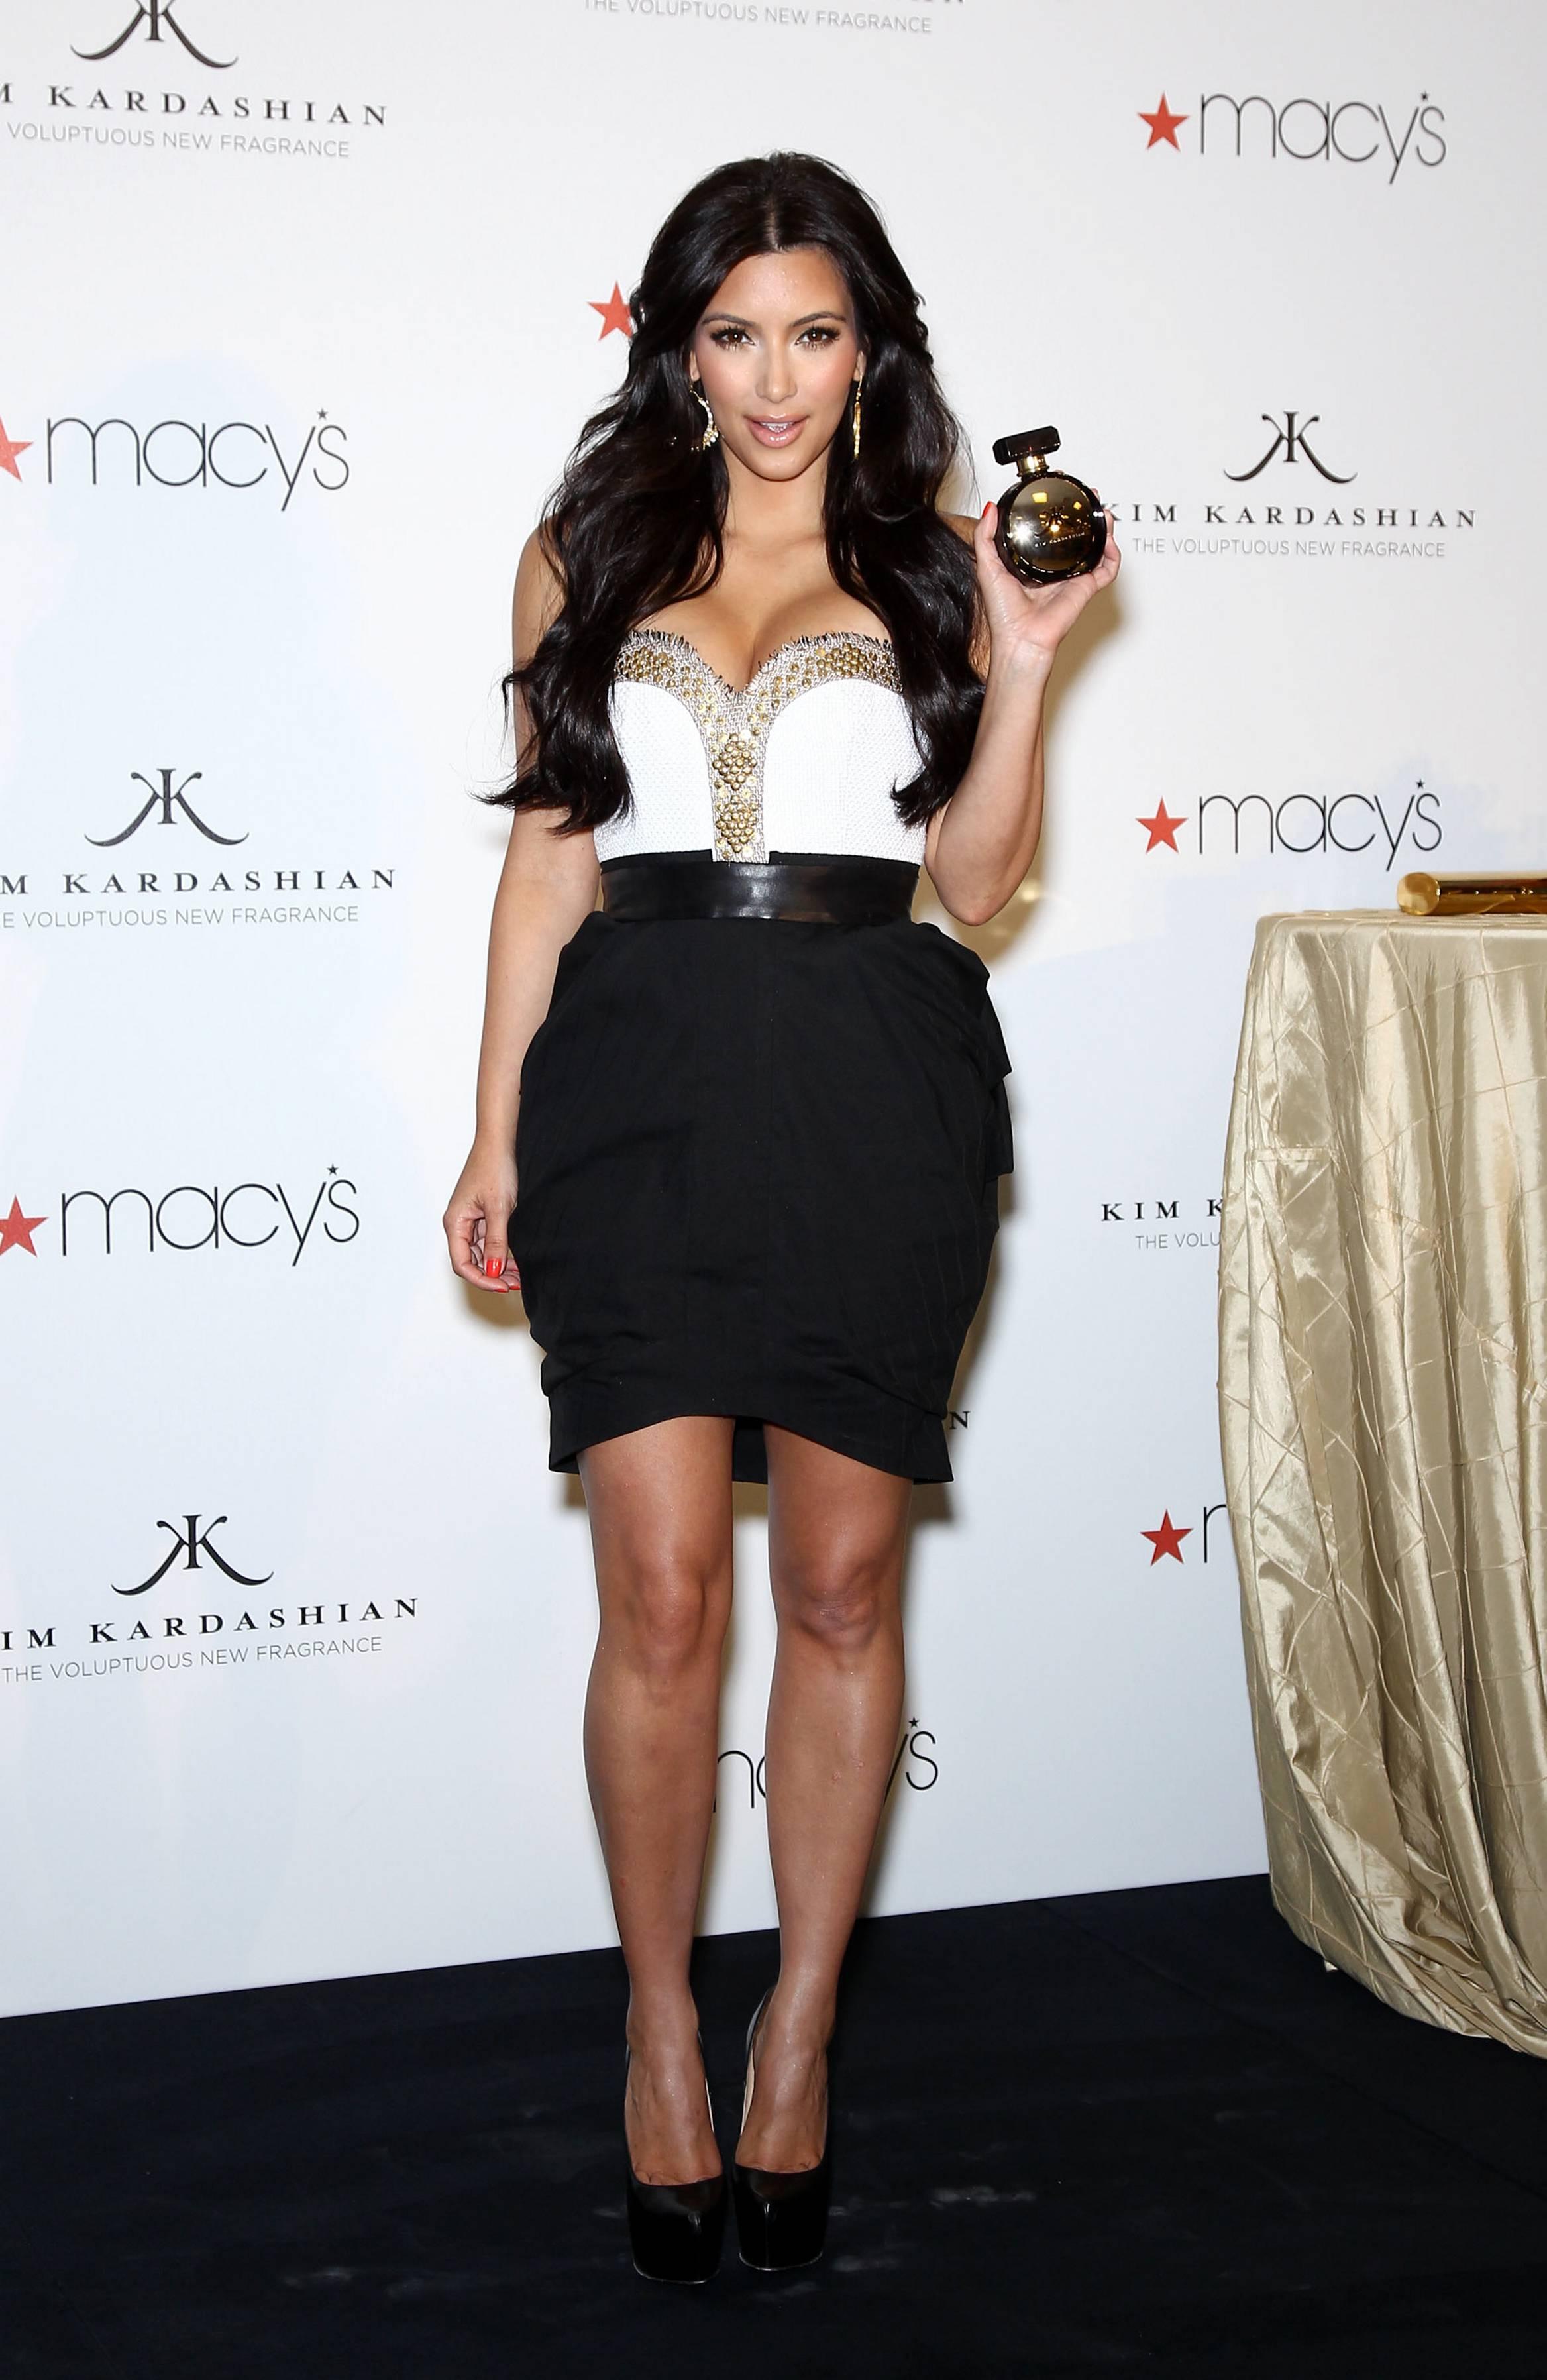 84908_celebrity_paradise.com_Kim_Kardashian_Fragance_06_122_178lo.jpg